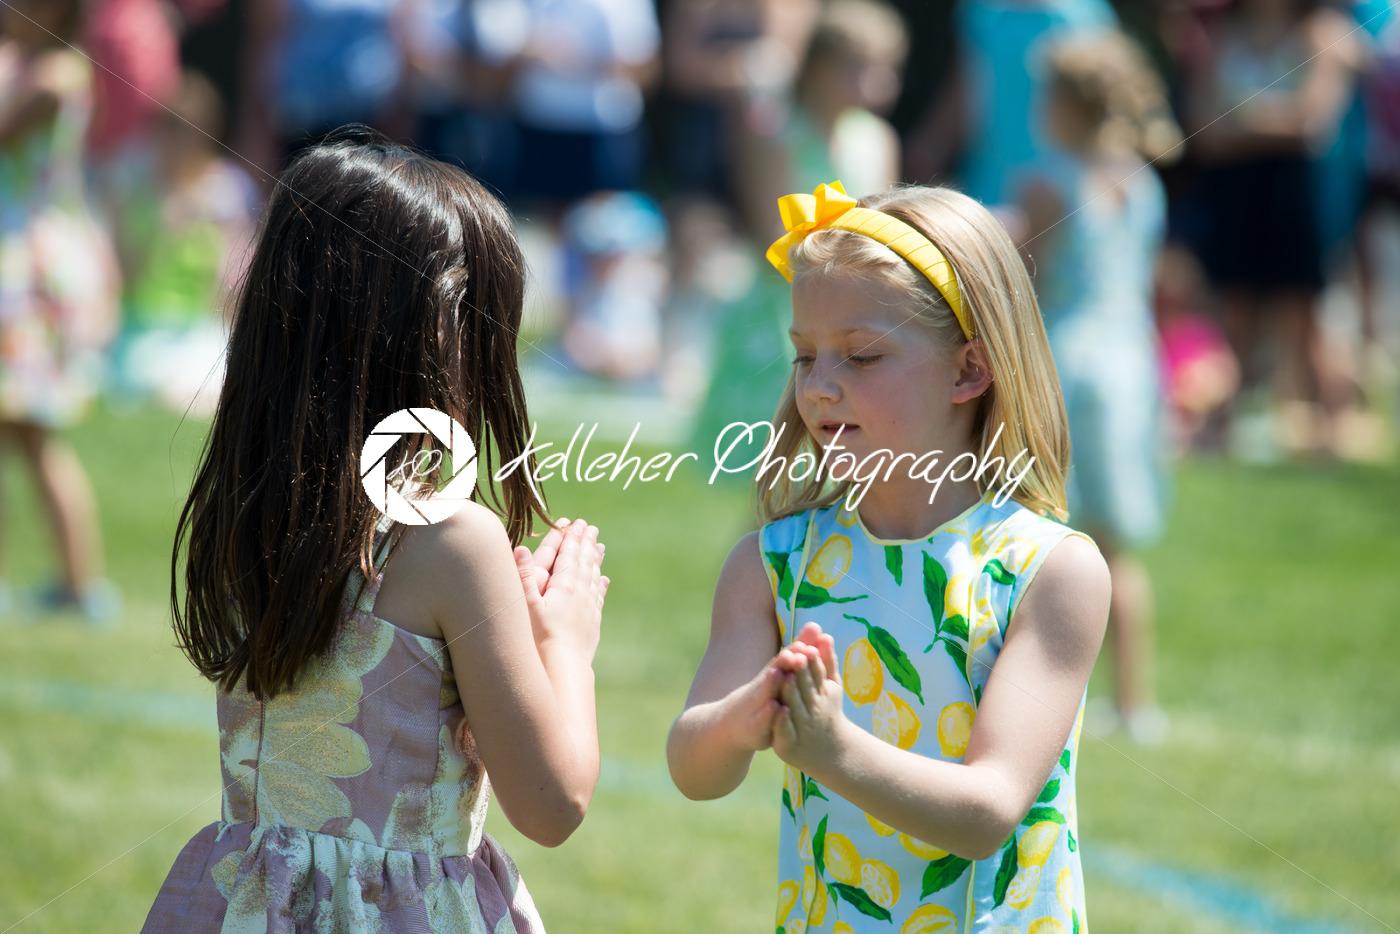 20170519-113259-00310.jpg - Kelleher Photography Store